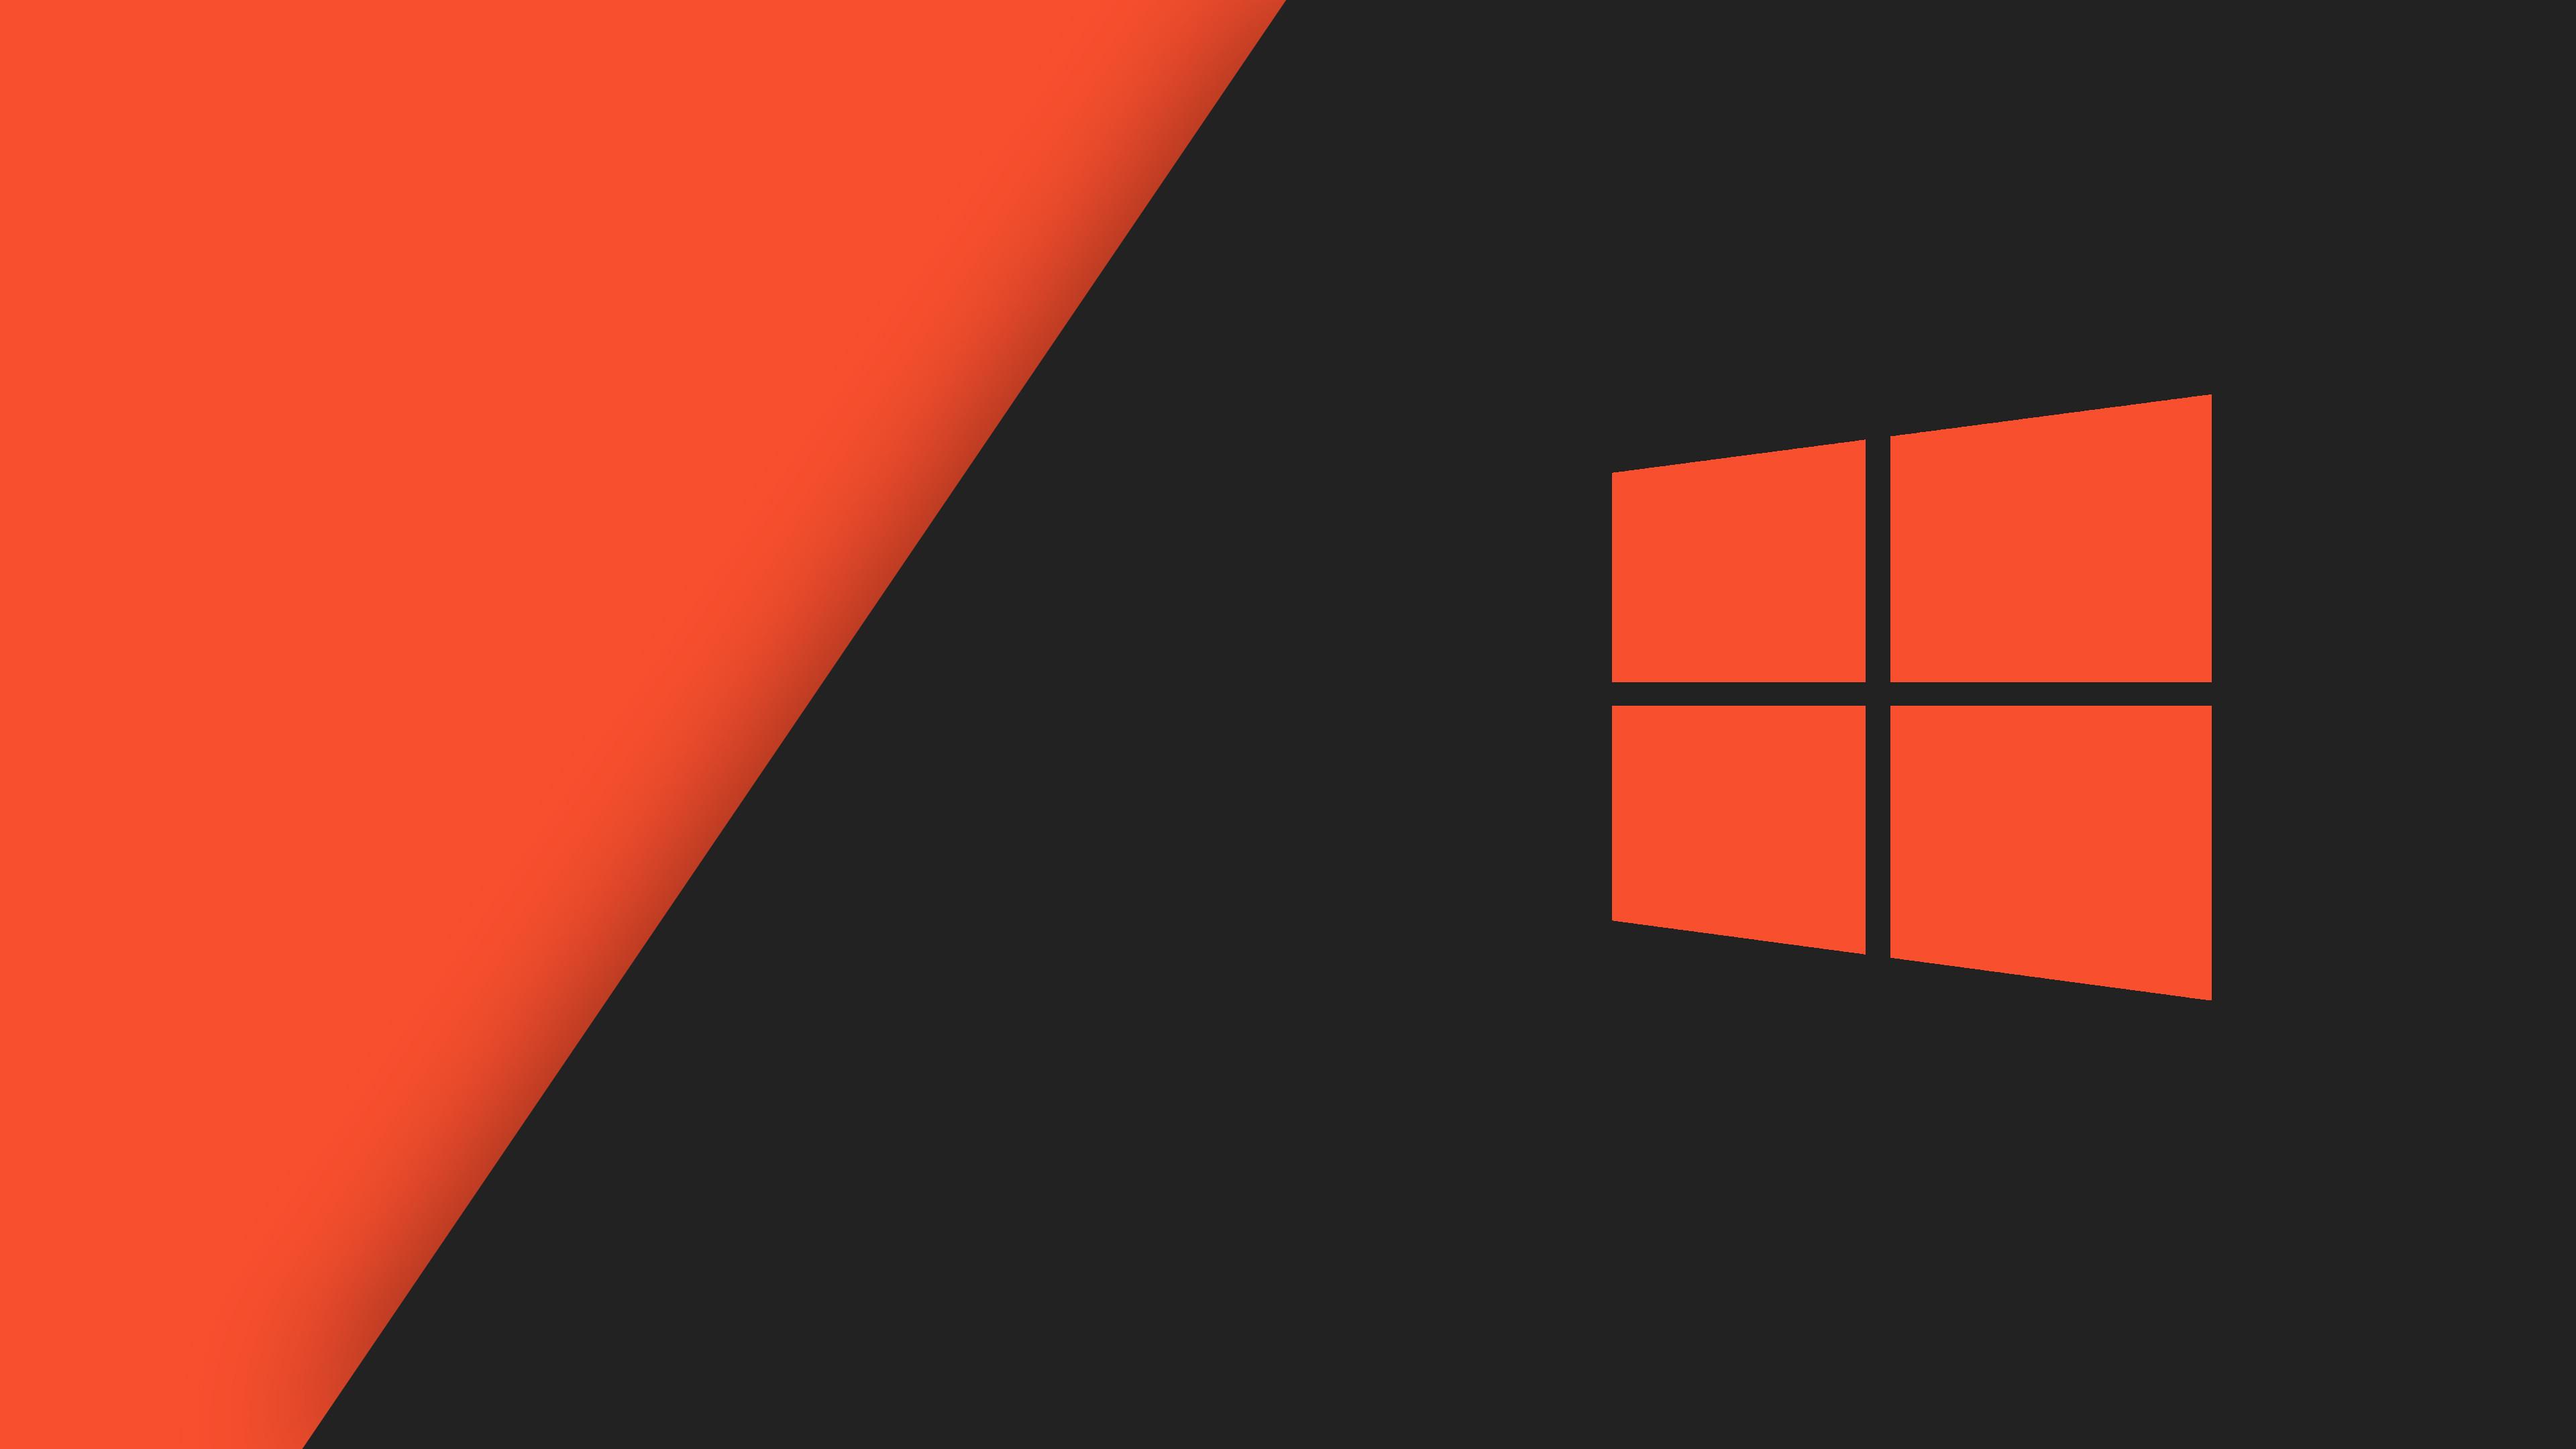 Orange Black Windows 10 HD Wallpaper